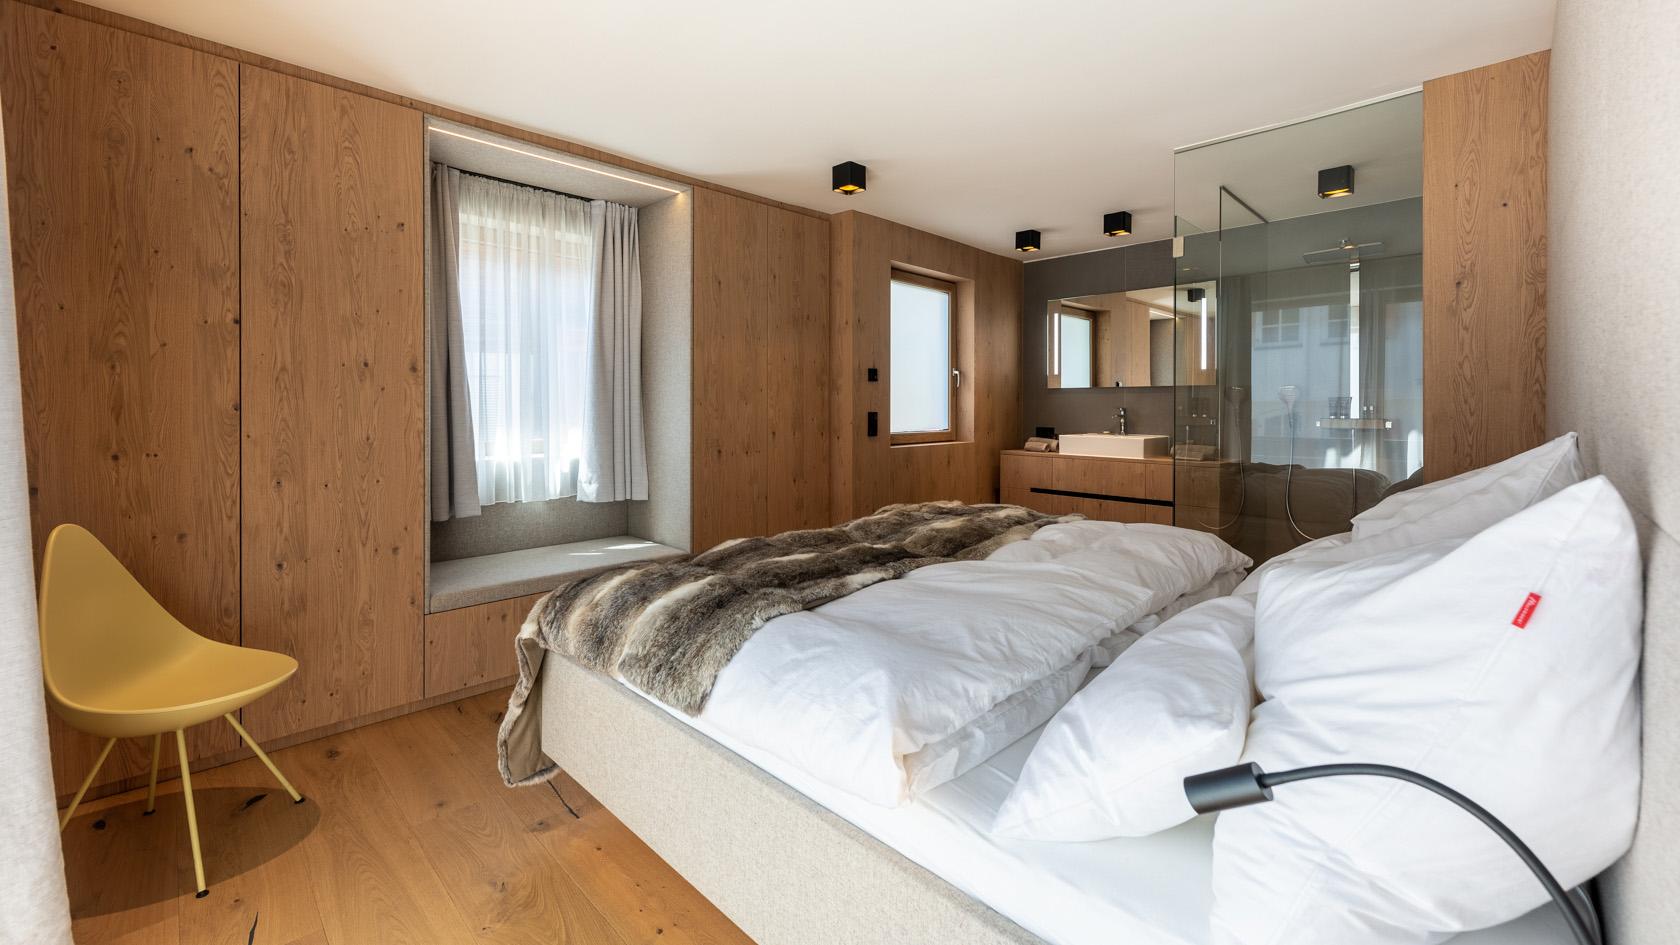 The Viktor Apartment Apartments, Austria